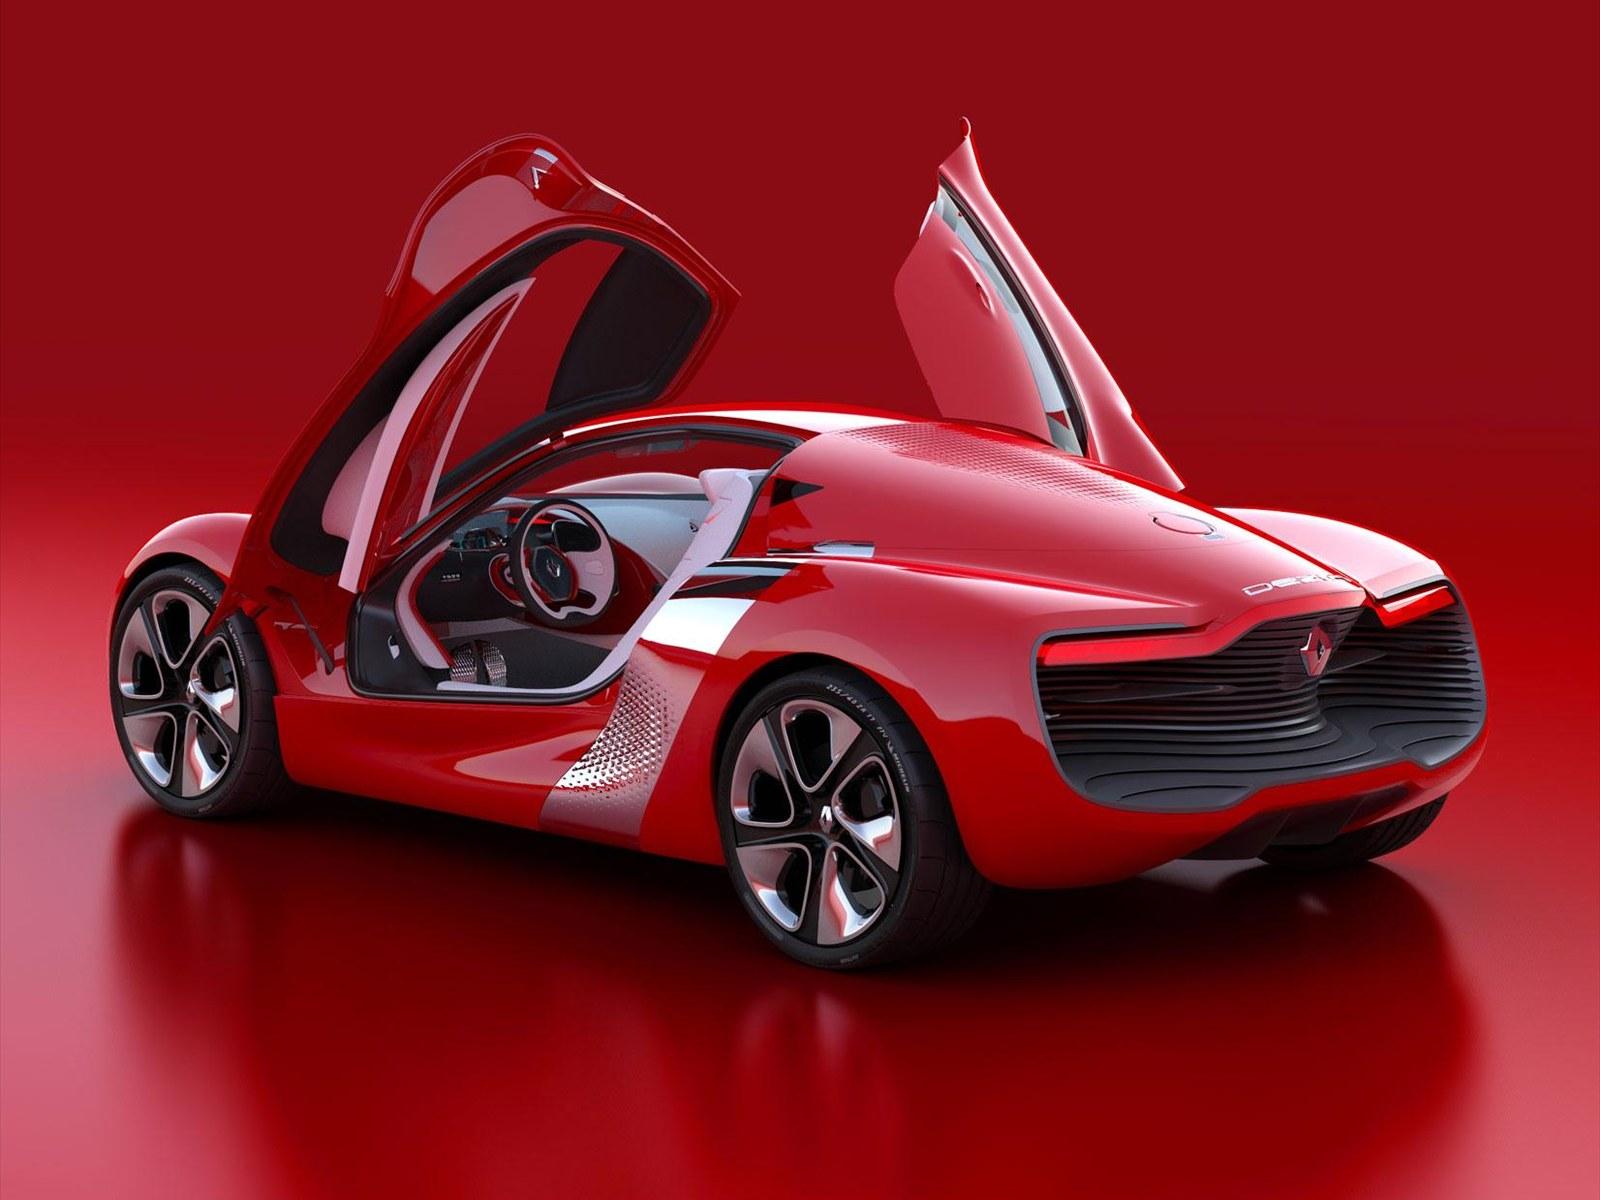 Ultimate Machines: Renault DeZir 2010